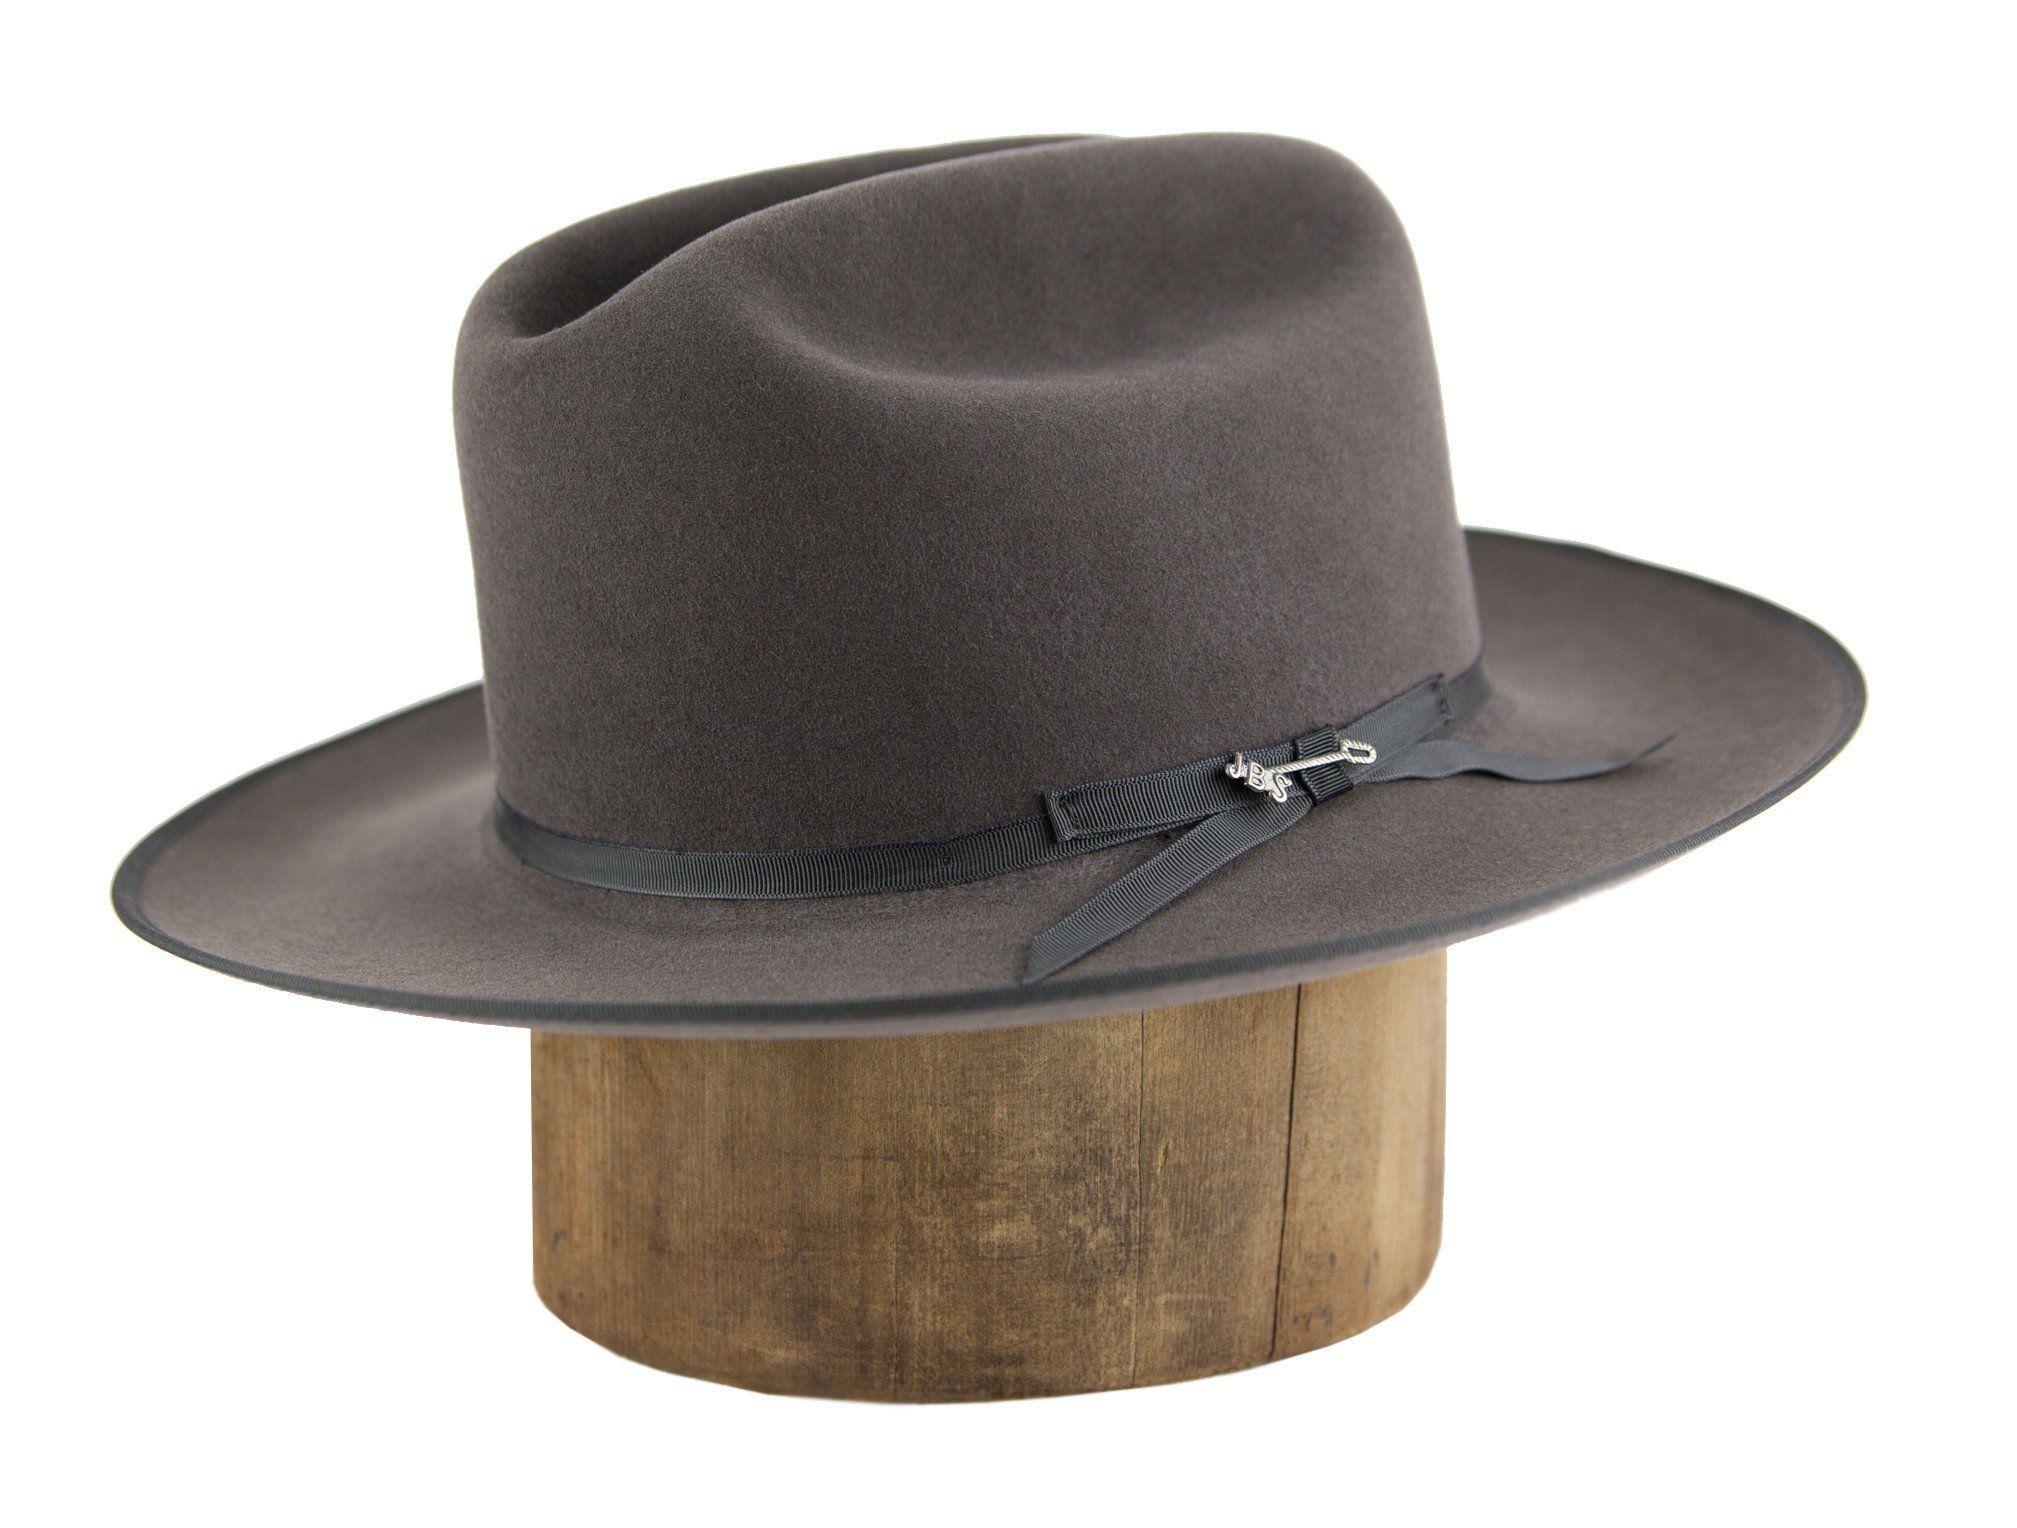 Royal Open Road Soft Version Mens Dress Hats Bohemian Style Men Hats For Men